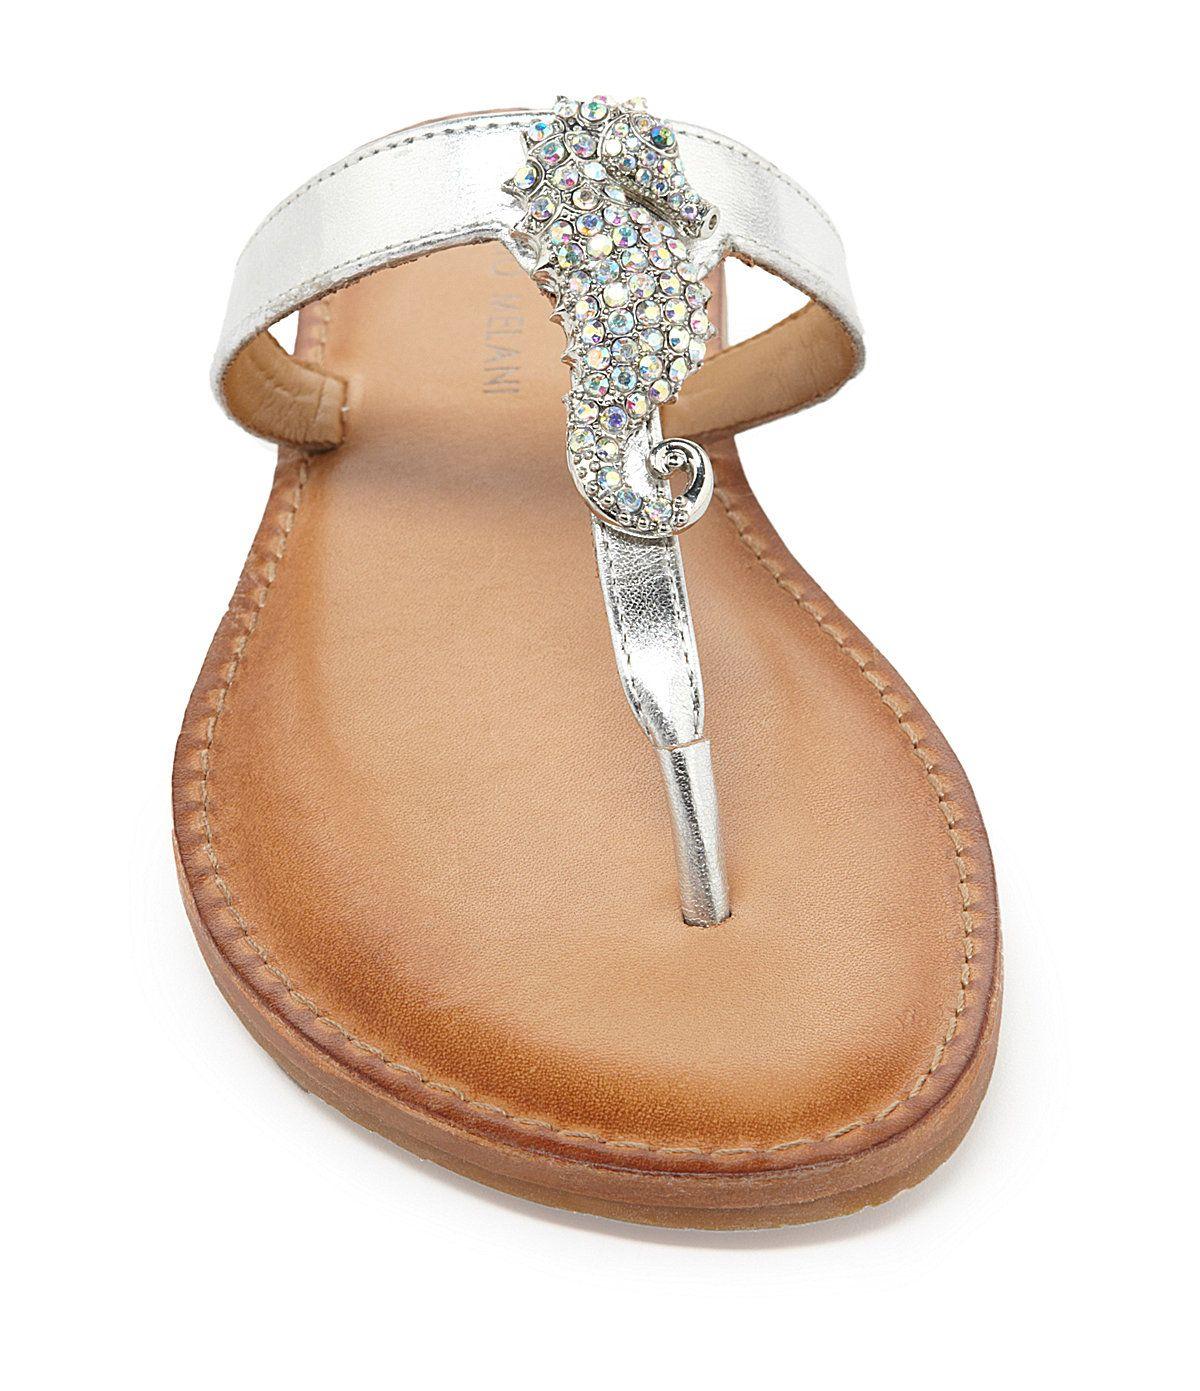 28ec89bb5407 Antonio Melani Seymour Flat Sandals - Dillards.com